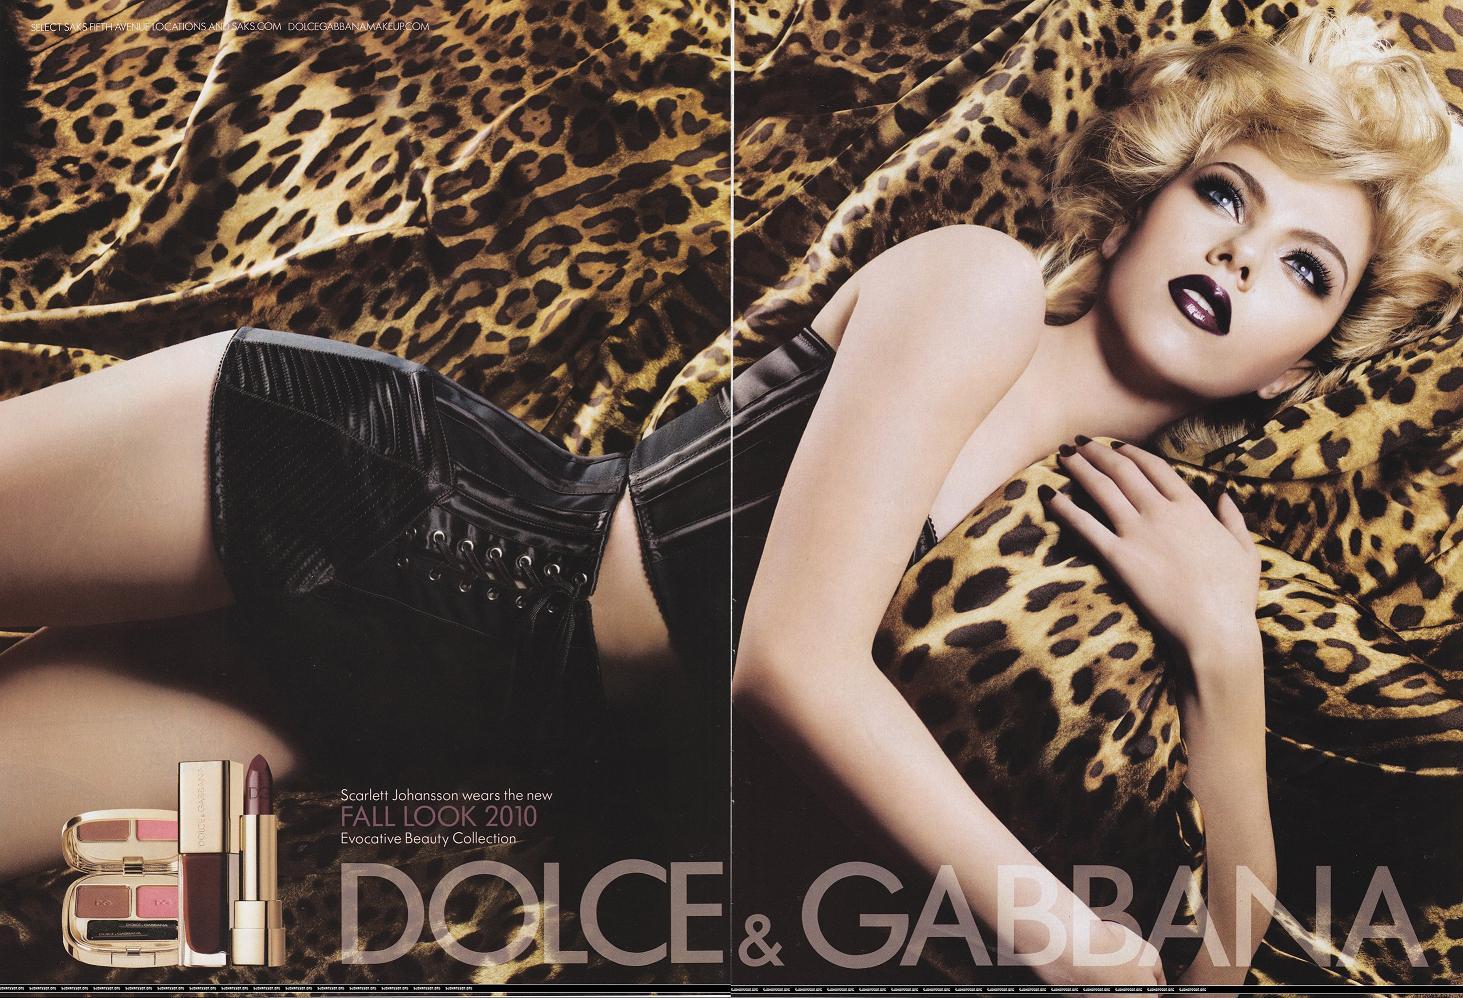 Реклама косметики по тнт 2 фотография